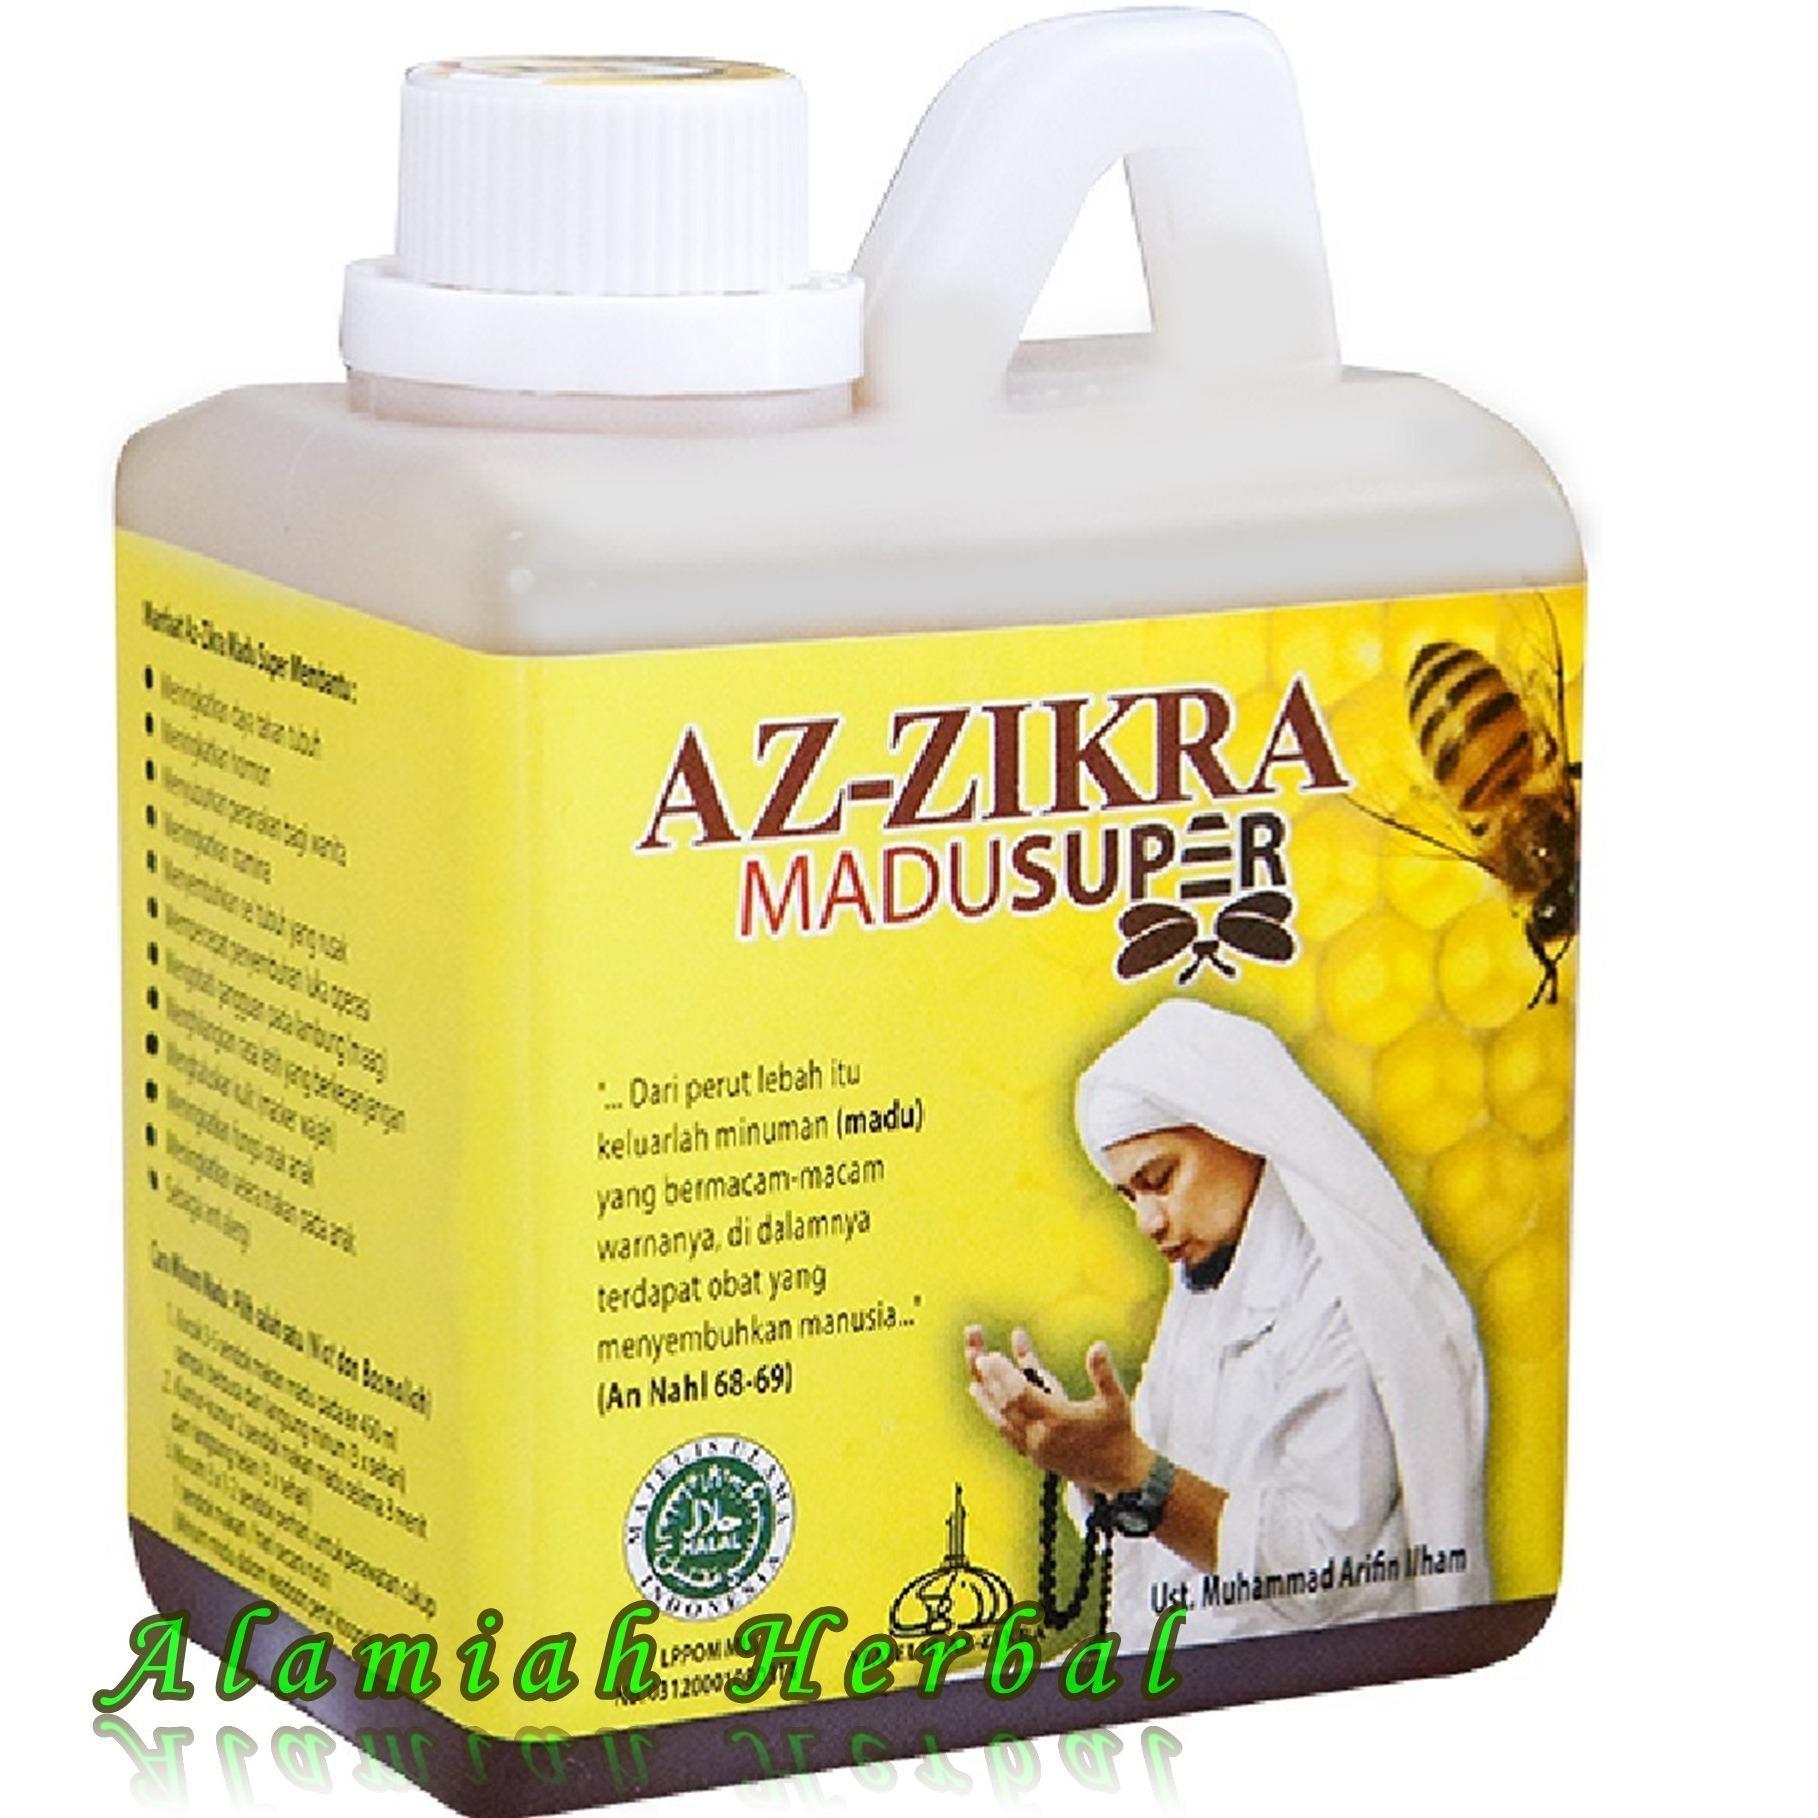 Review Alamiah Herbal Madu Az Zikra Madu Super Az Zikra Madu Manis Az Zikra Madu Arifin Ilham Madu Asli 500Gr Az Zikra Di Jawa Barat